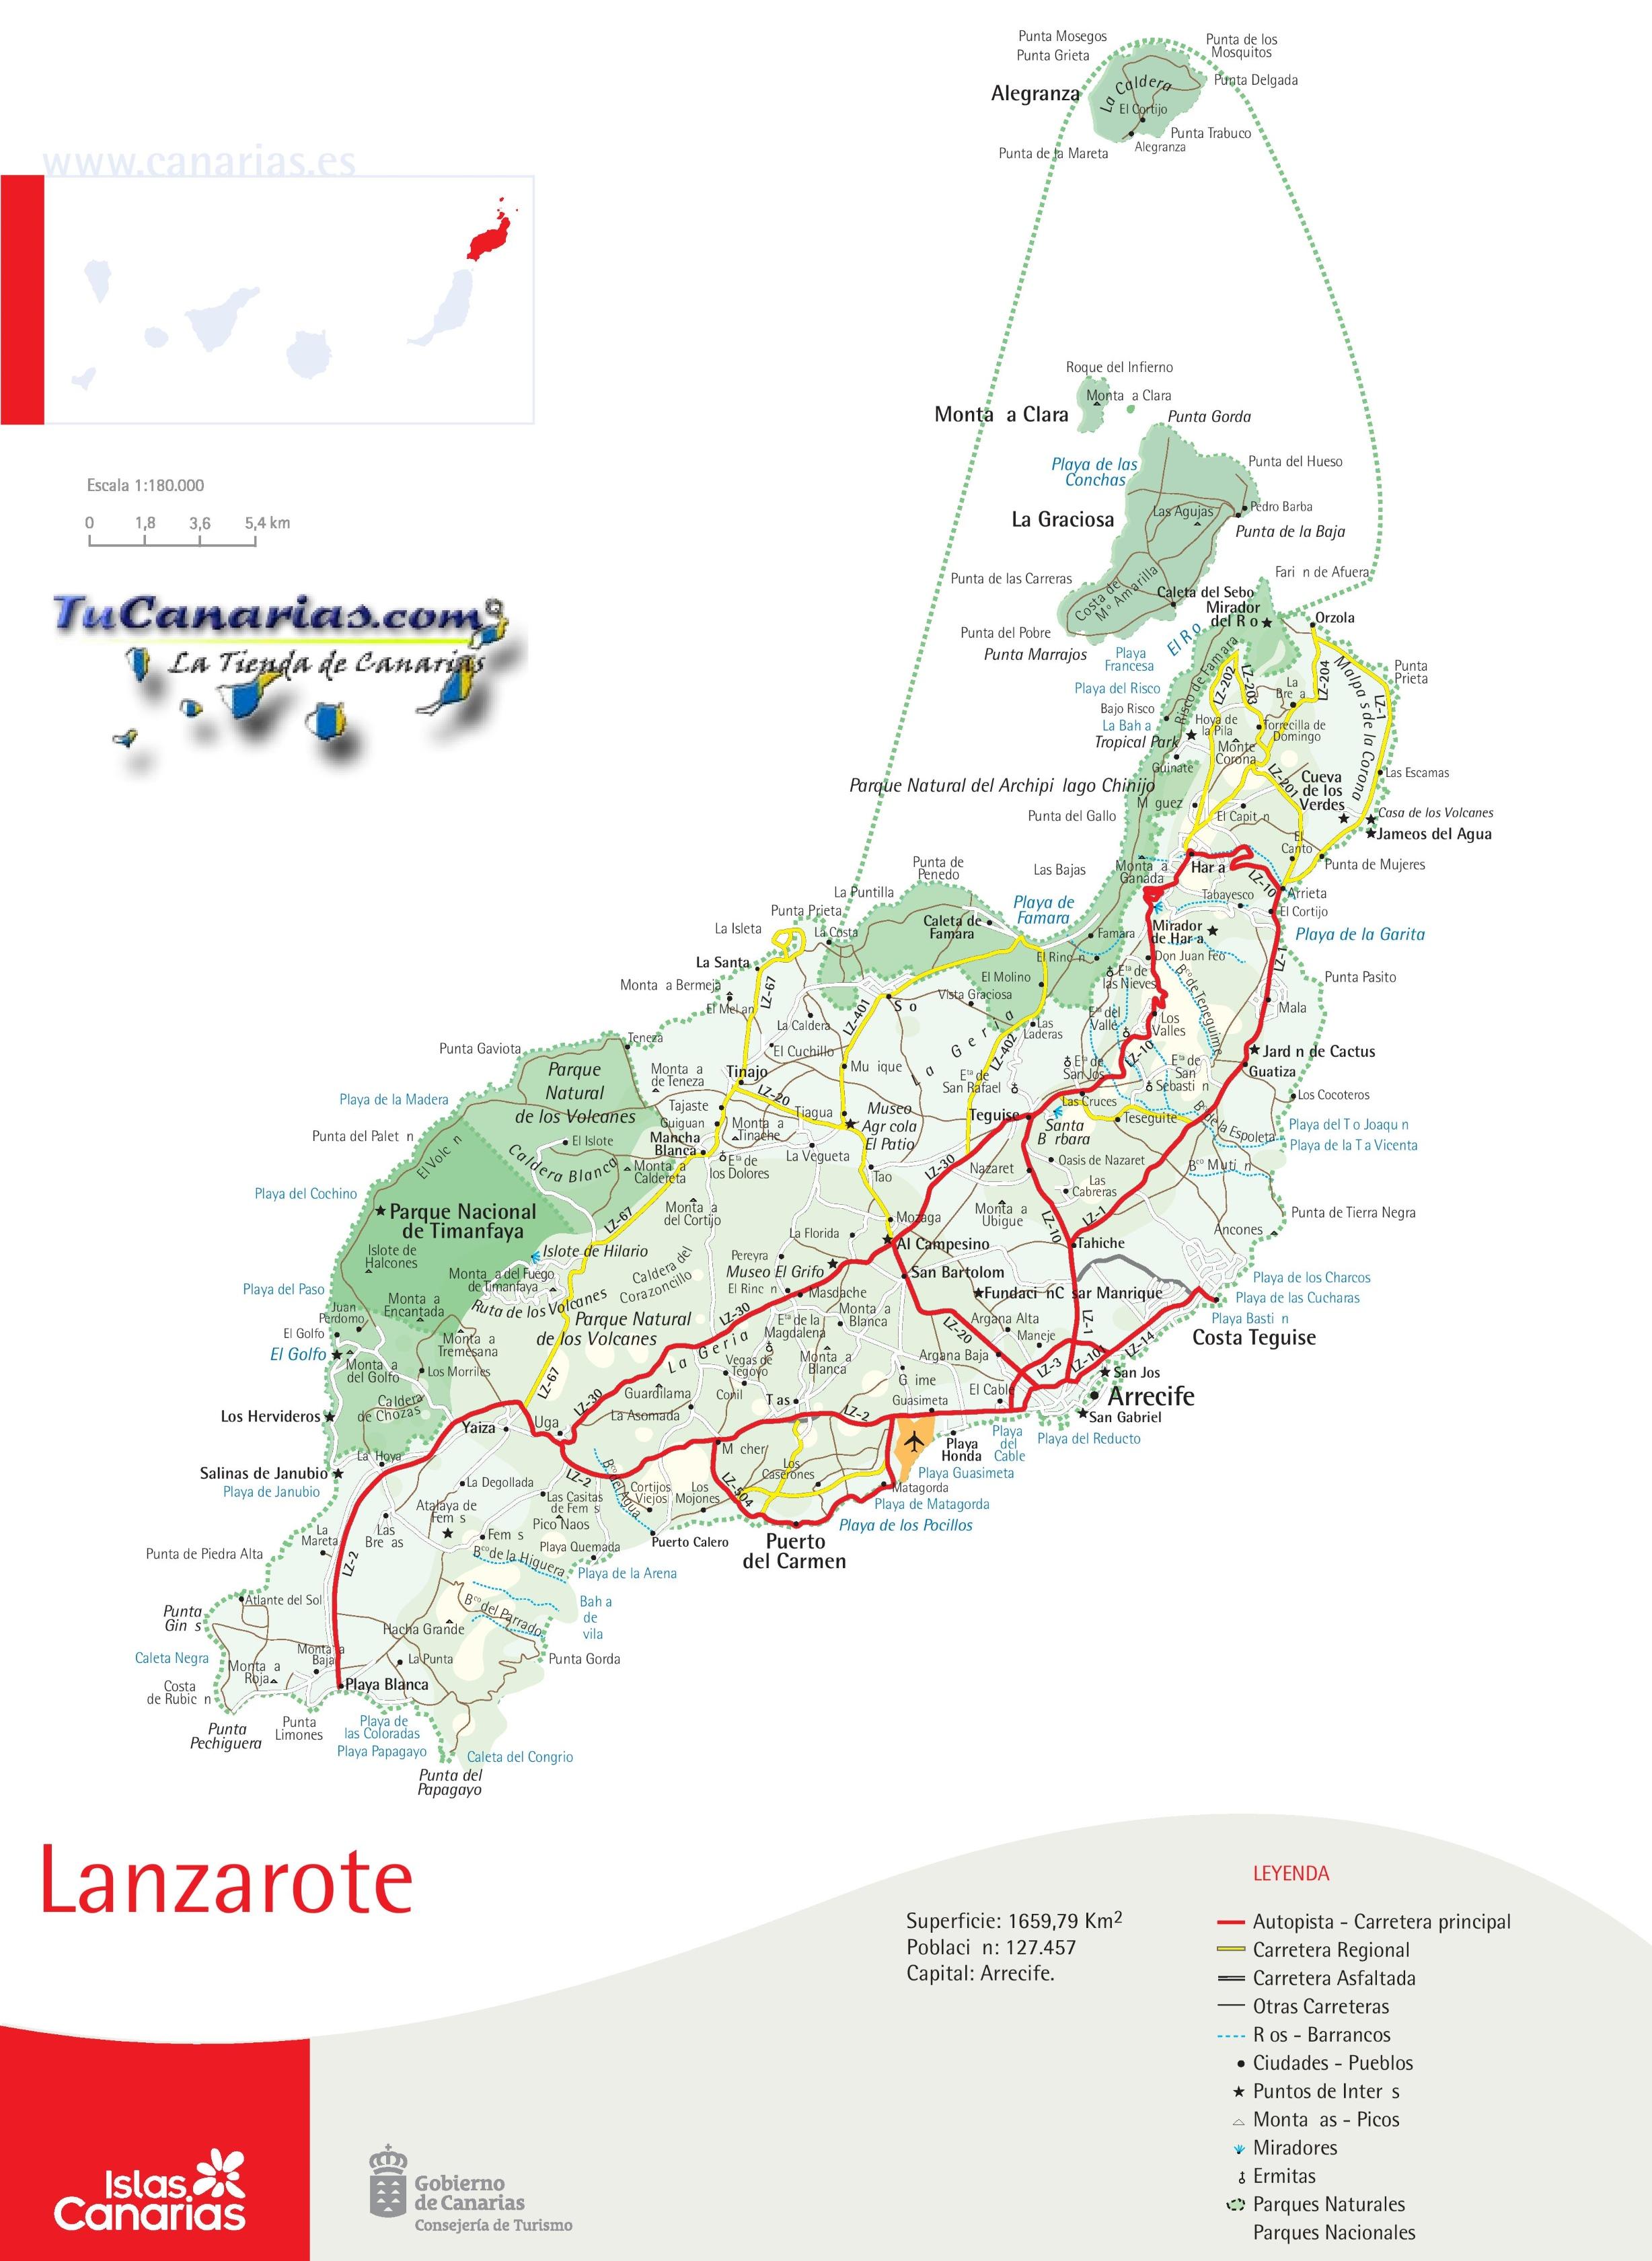 Map Of Lanzarote Lanzarote road map Map Of Lanzarote